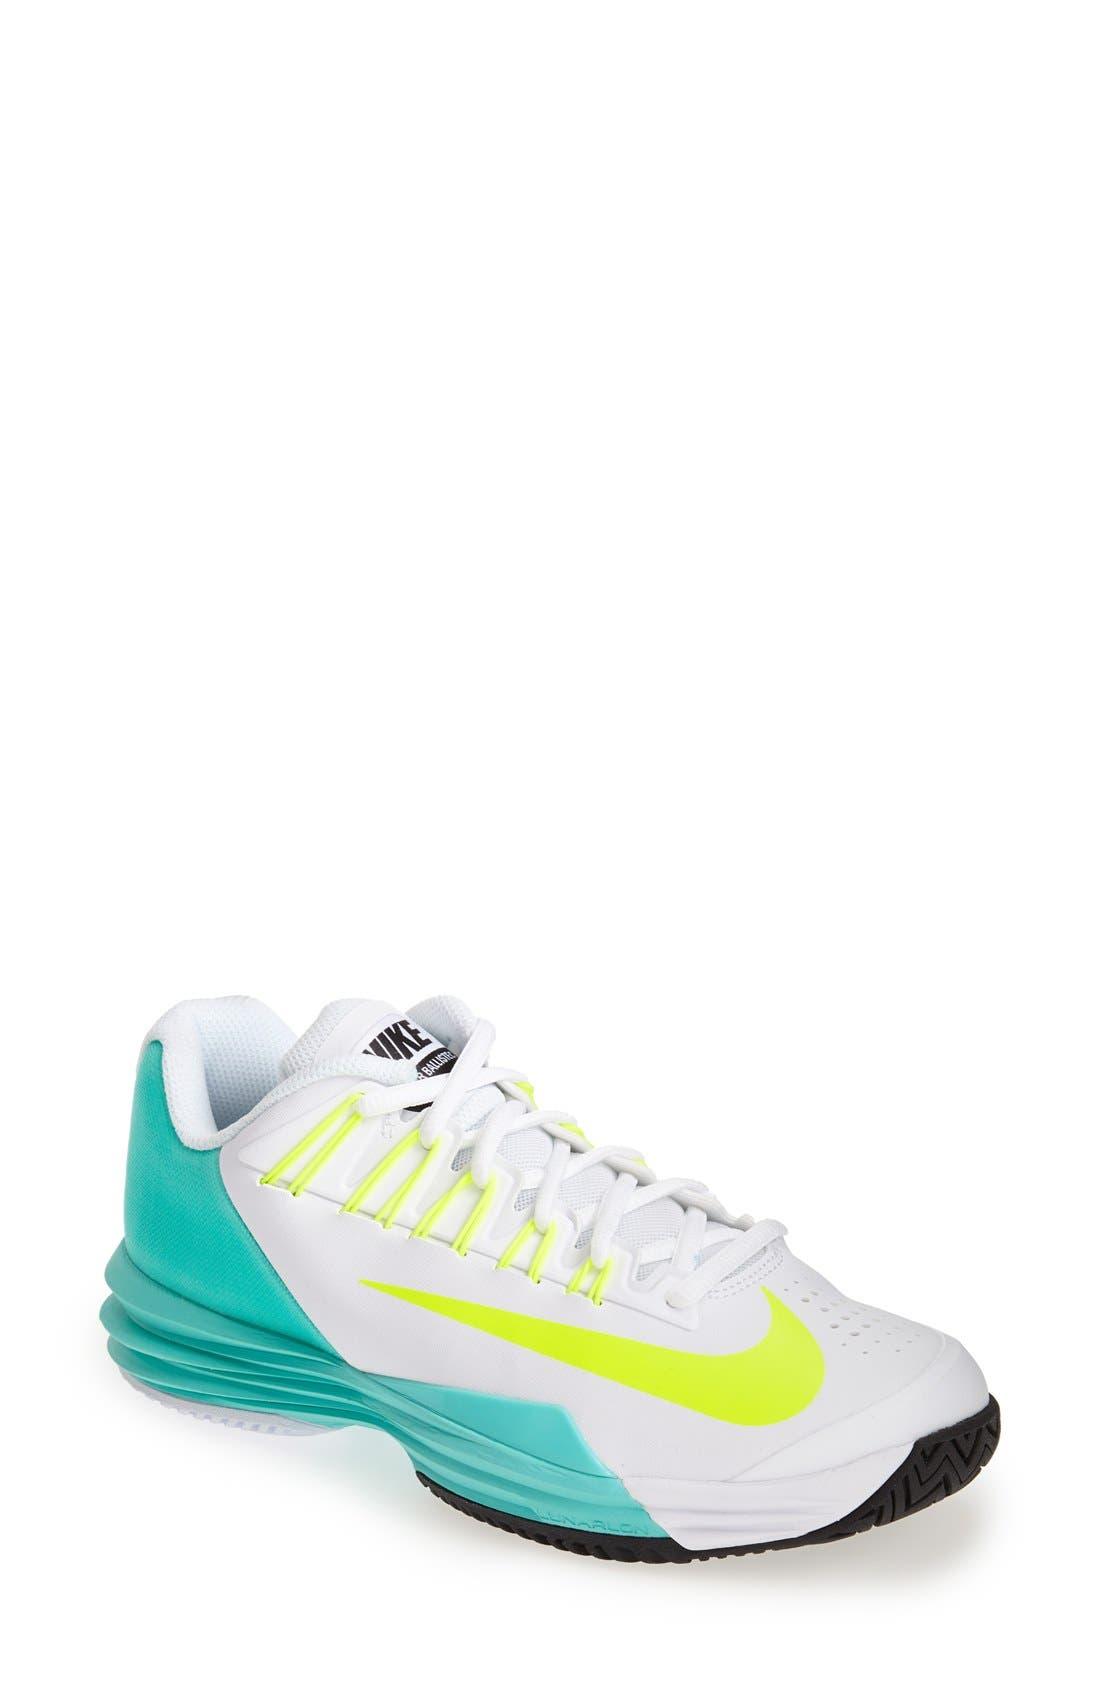 Alternate Image 1 Selected - Nike 'Lunar Ballistec' Tennis Shoe (Women)